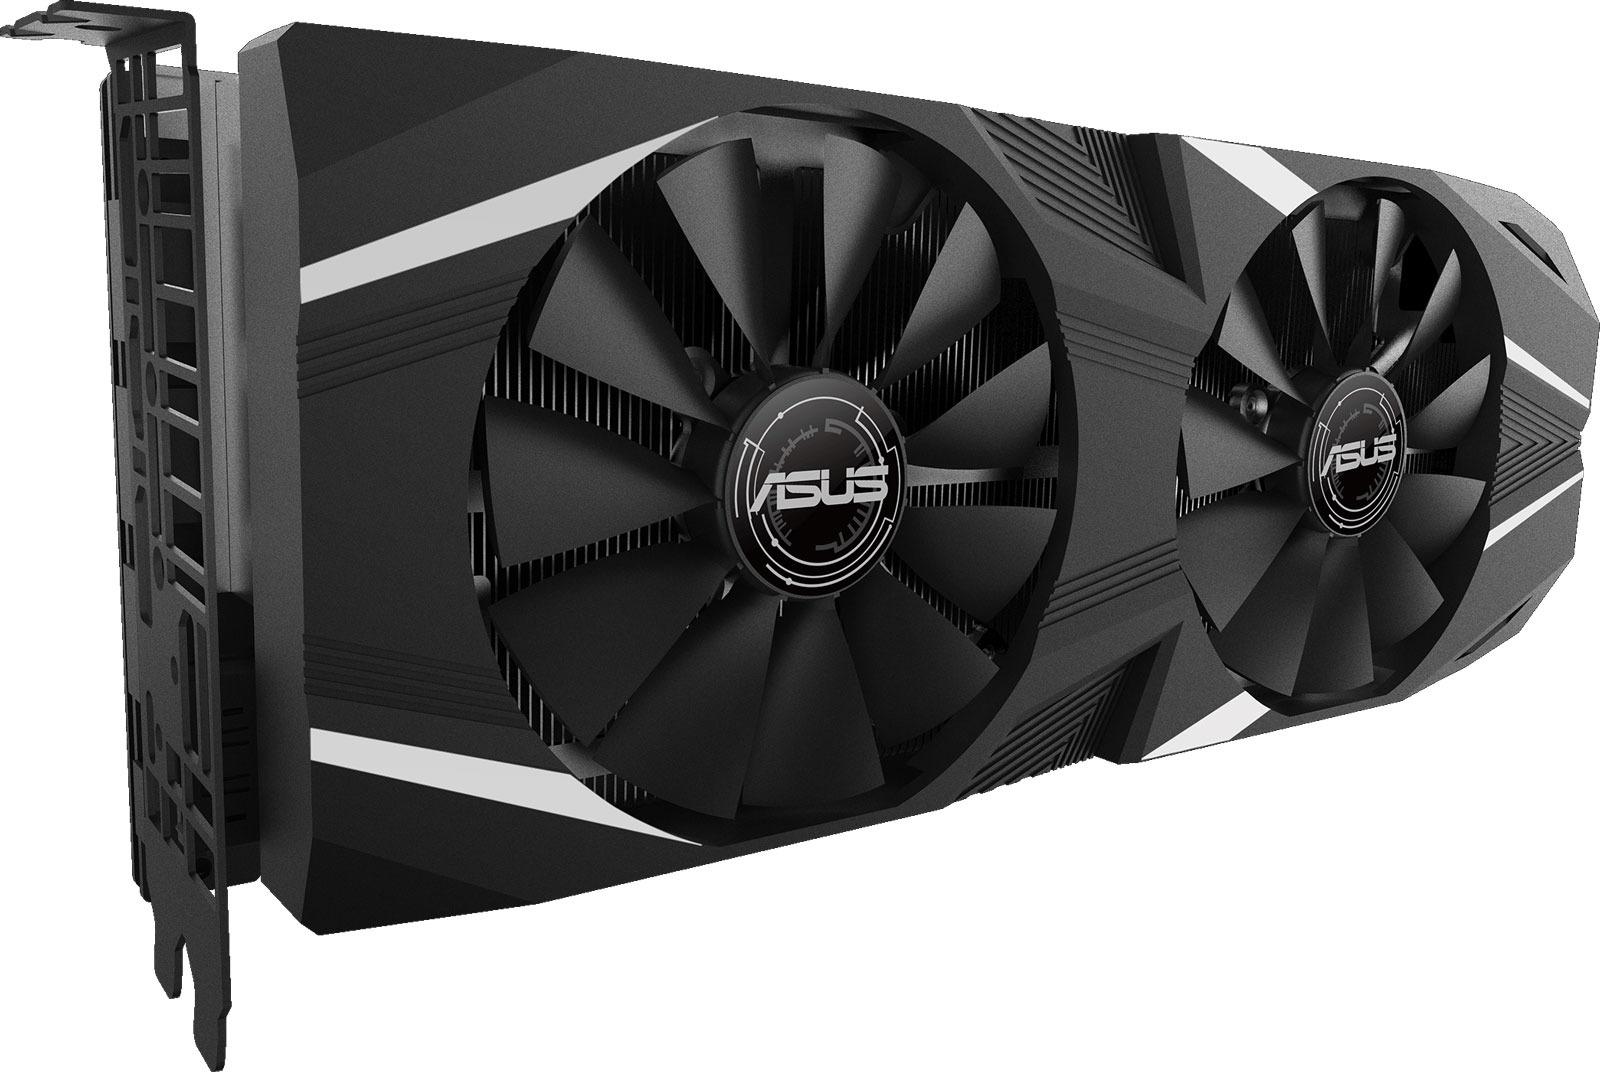 Видеокарта ASUS Dual GeForce RTX 2080 OC 8GB, 90YV0C30-M0NМ00 видеокарта msi geforce rtx 2080 duke 8g oc 8gb 1845 mhz nvidia rtx 2080 gddr6 14000mhz 256bit pci e usb type c hdmi dpx3